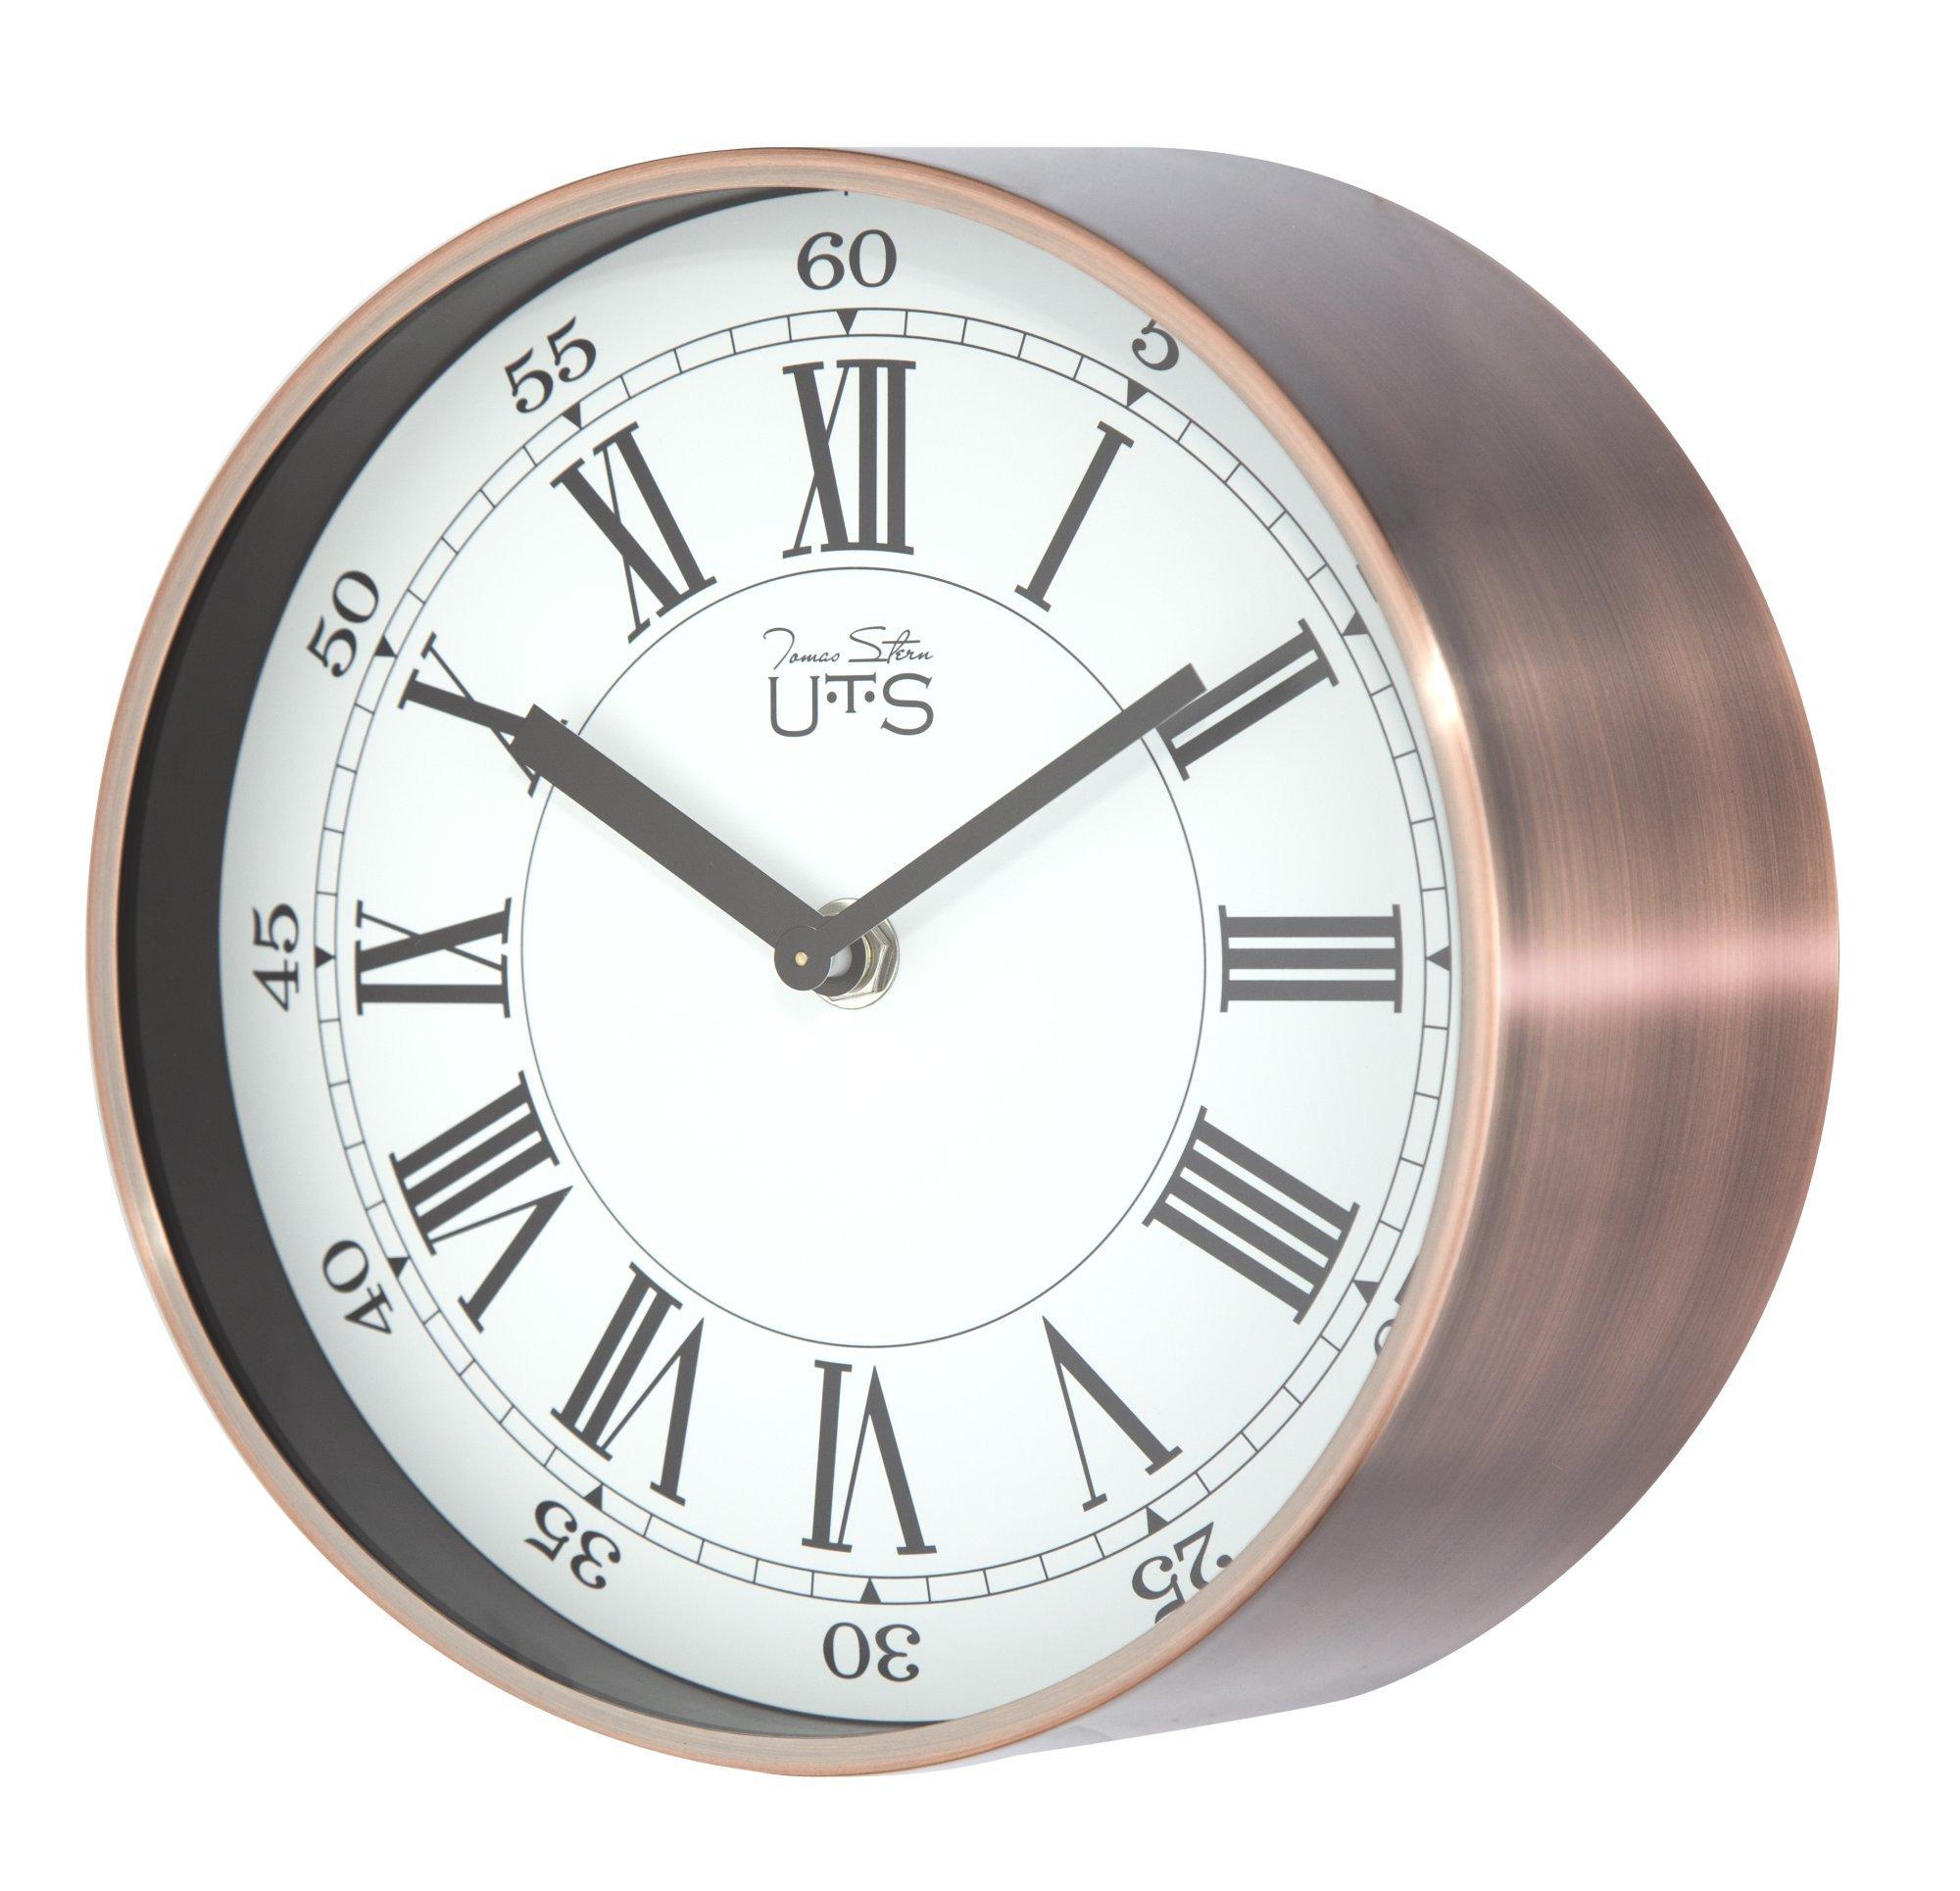 Часы настенные Часы настенные Tomas Stern 4015AC chasy-nastennye-tomas-stern-4015ac-germaniya.jpg